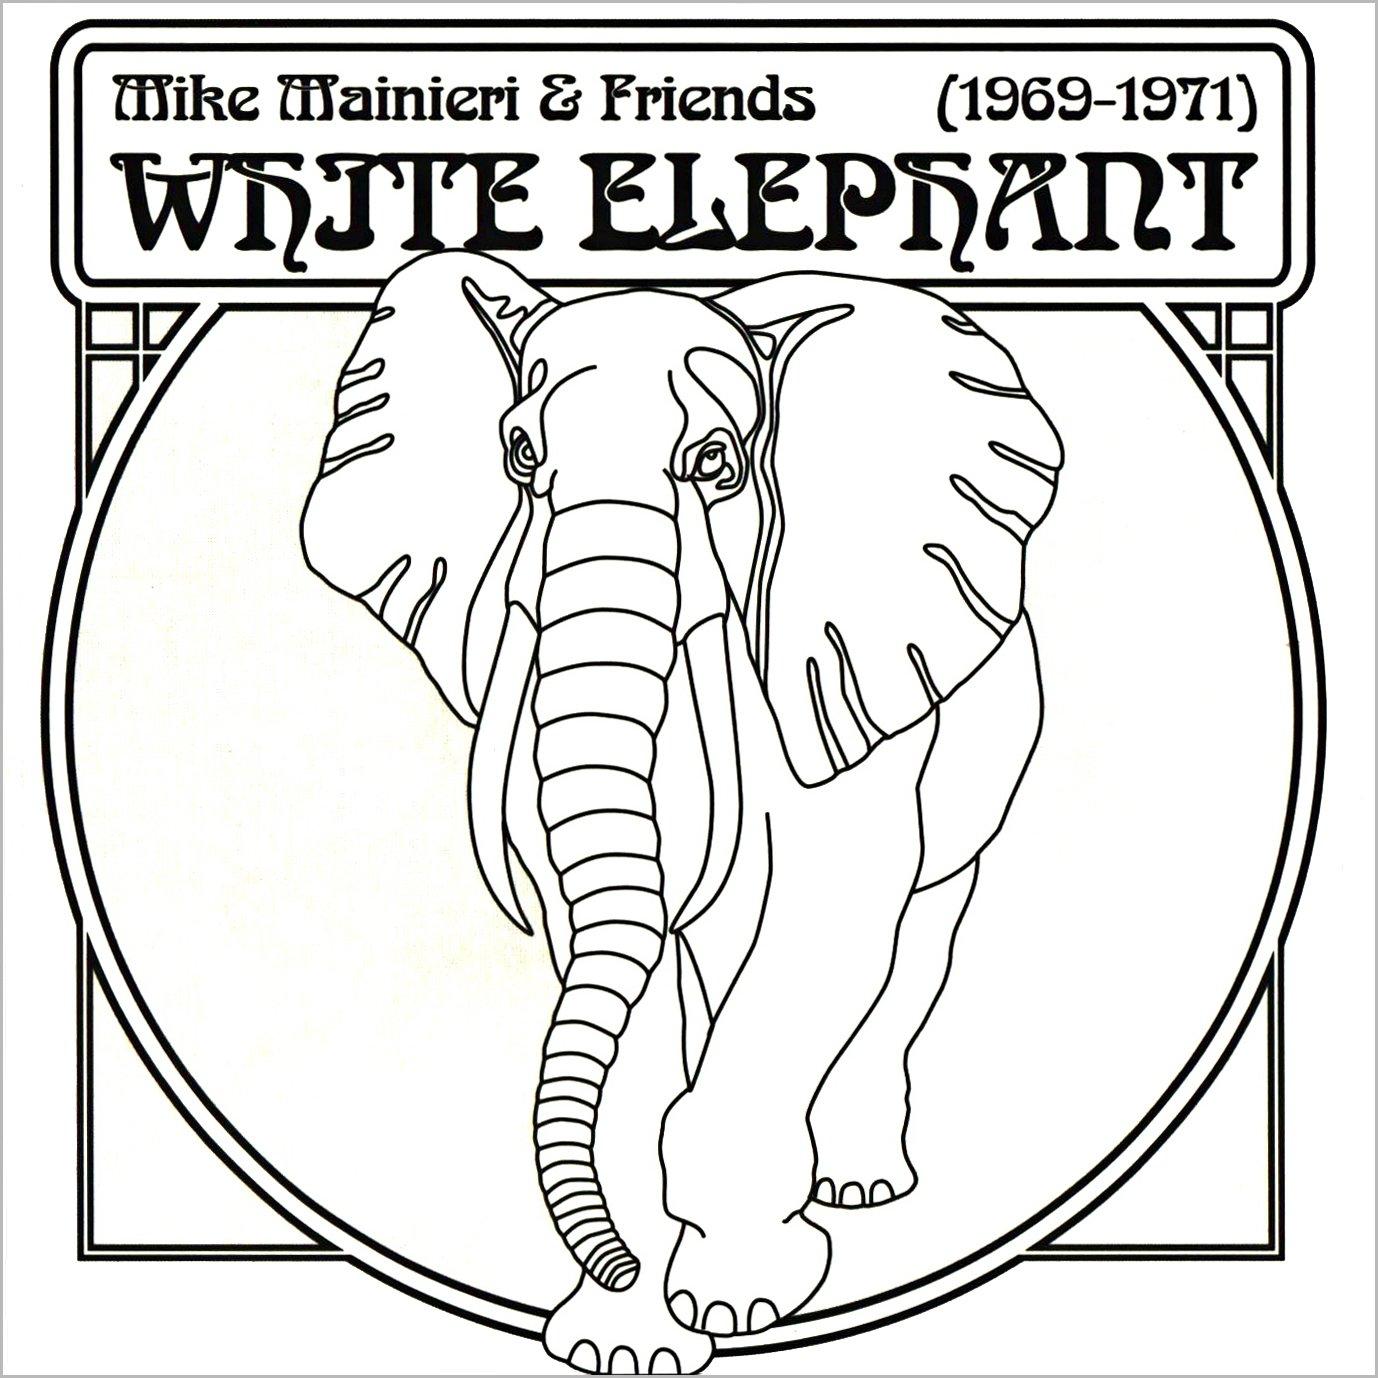 White Elephant   Mike Mainieri Amazon.de Musik